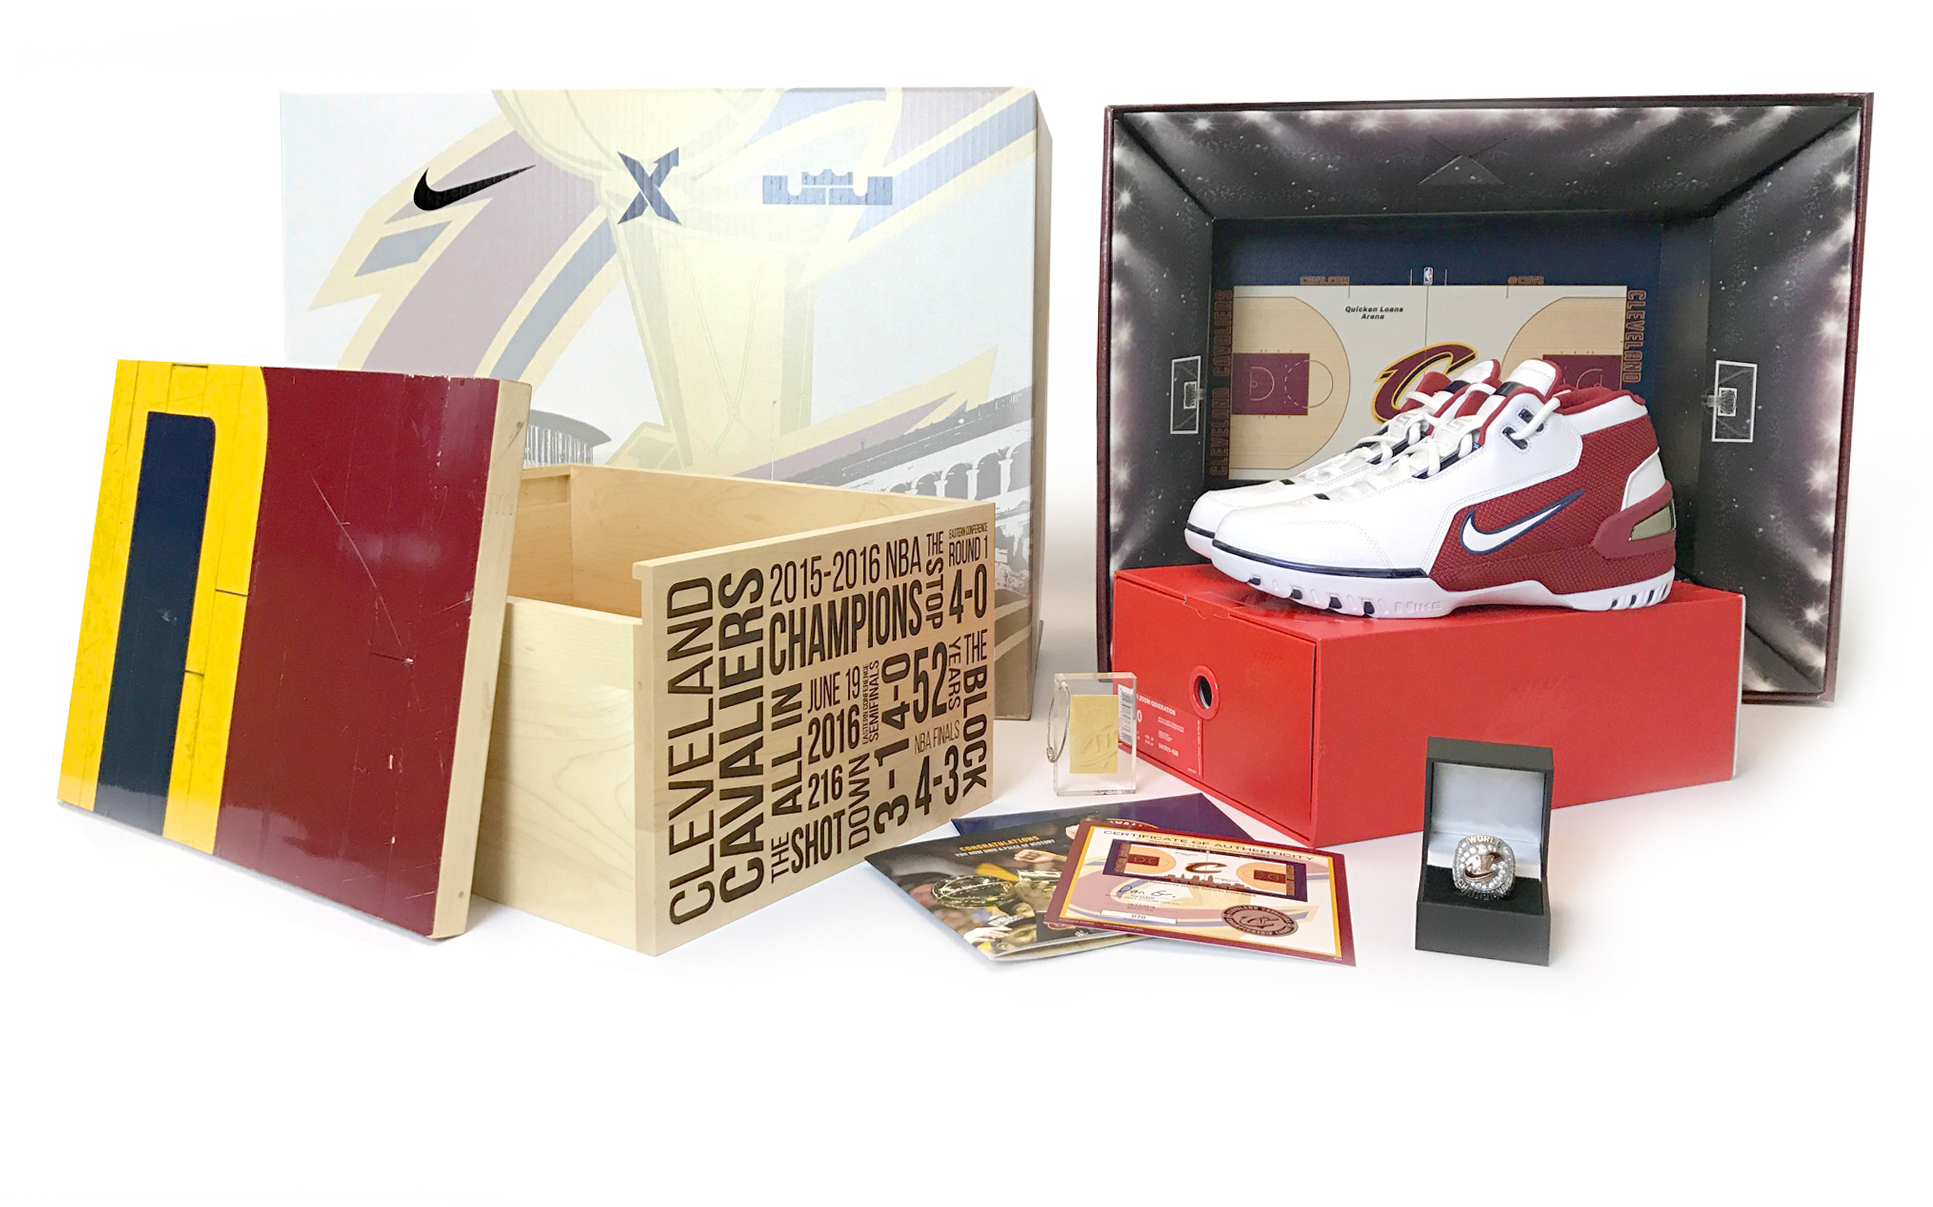 Nike Cavs Court SPO - LeBron 1 Air Zoom